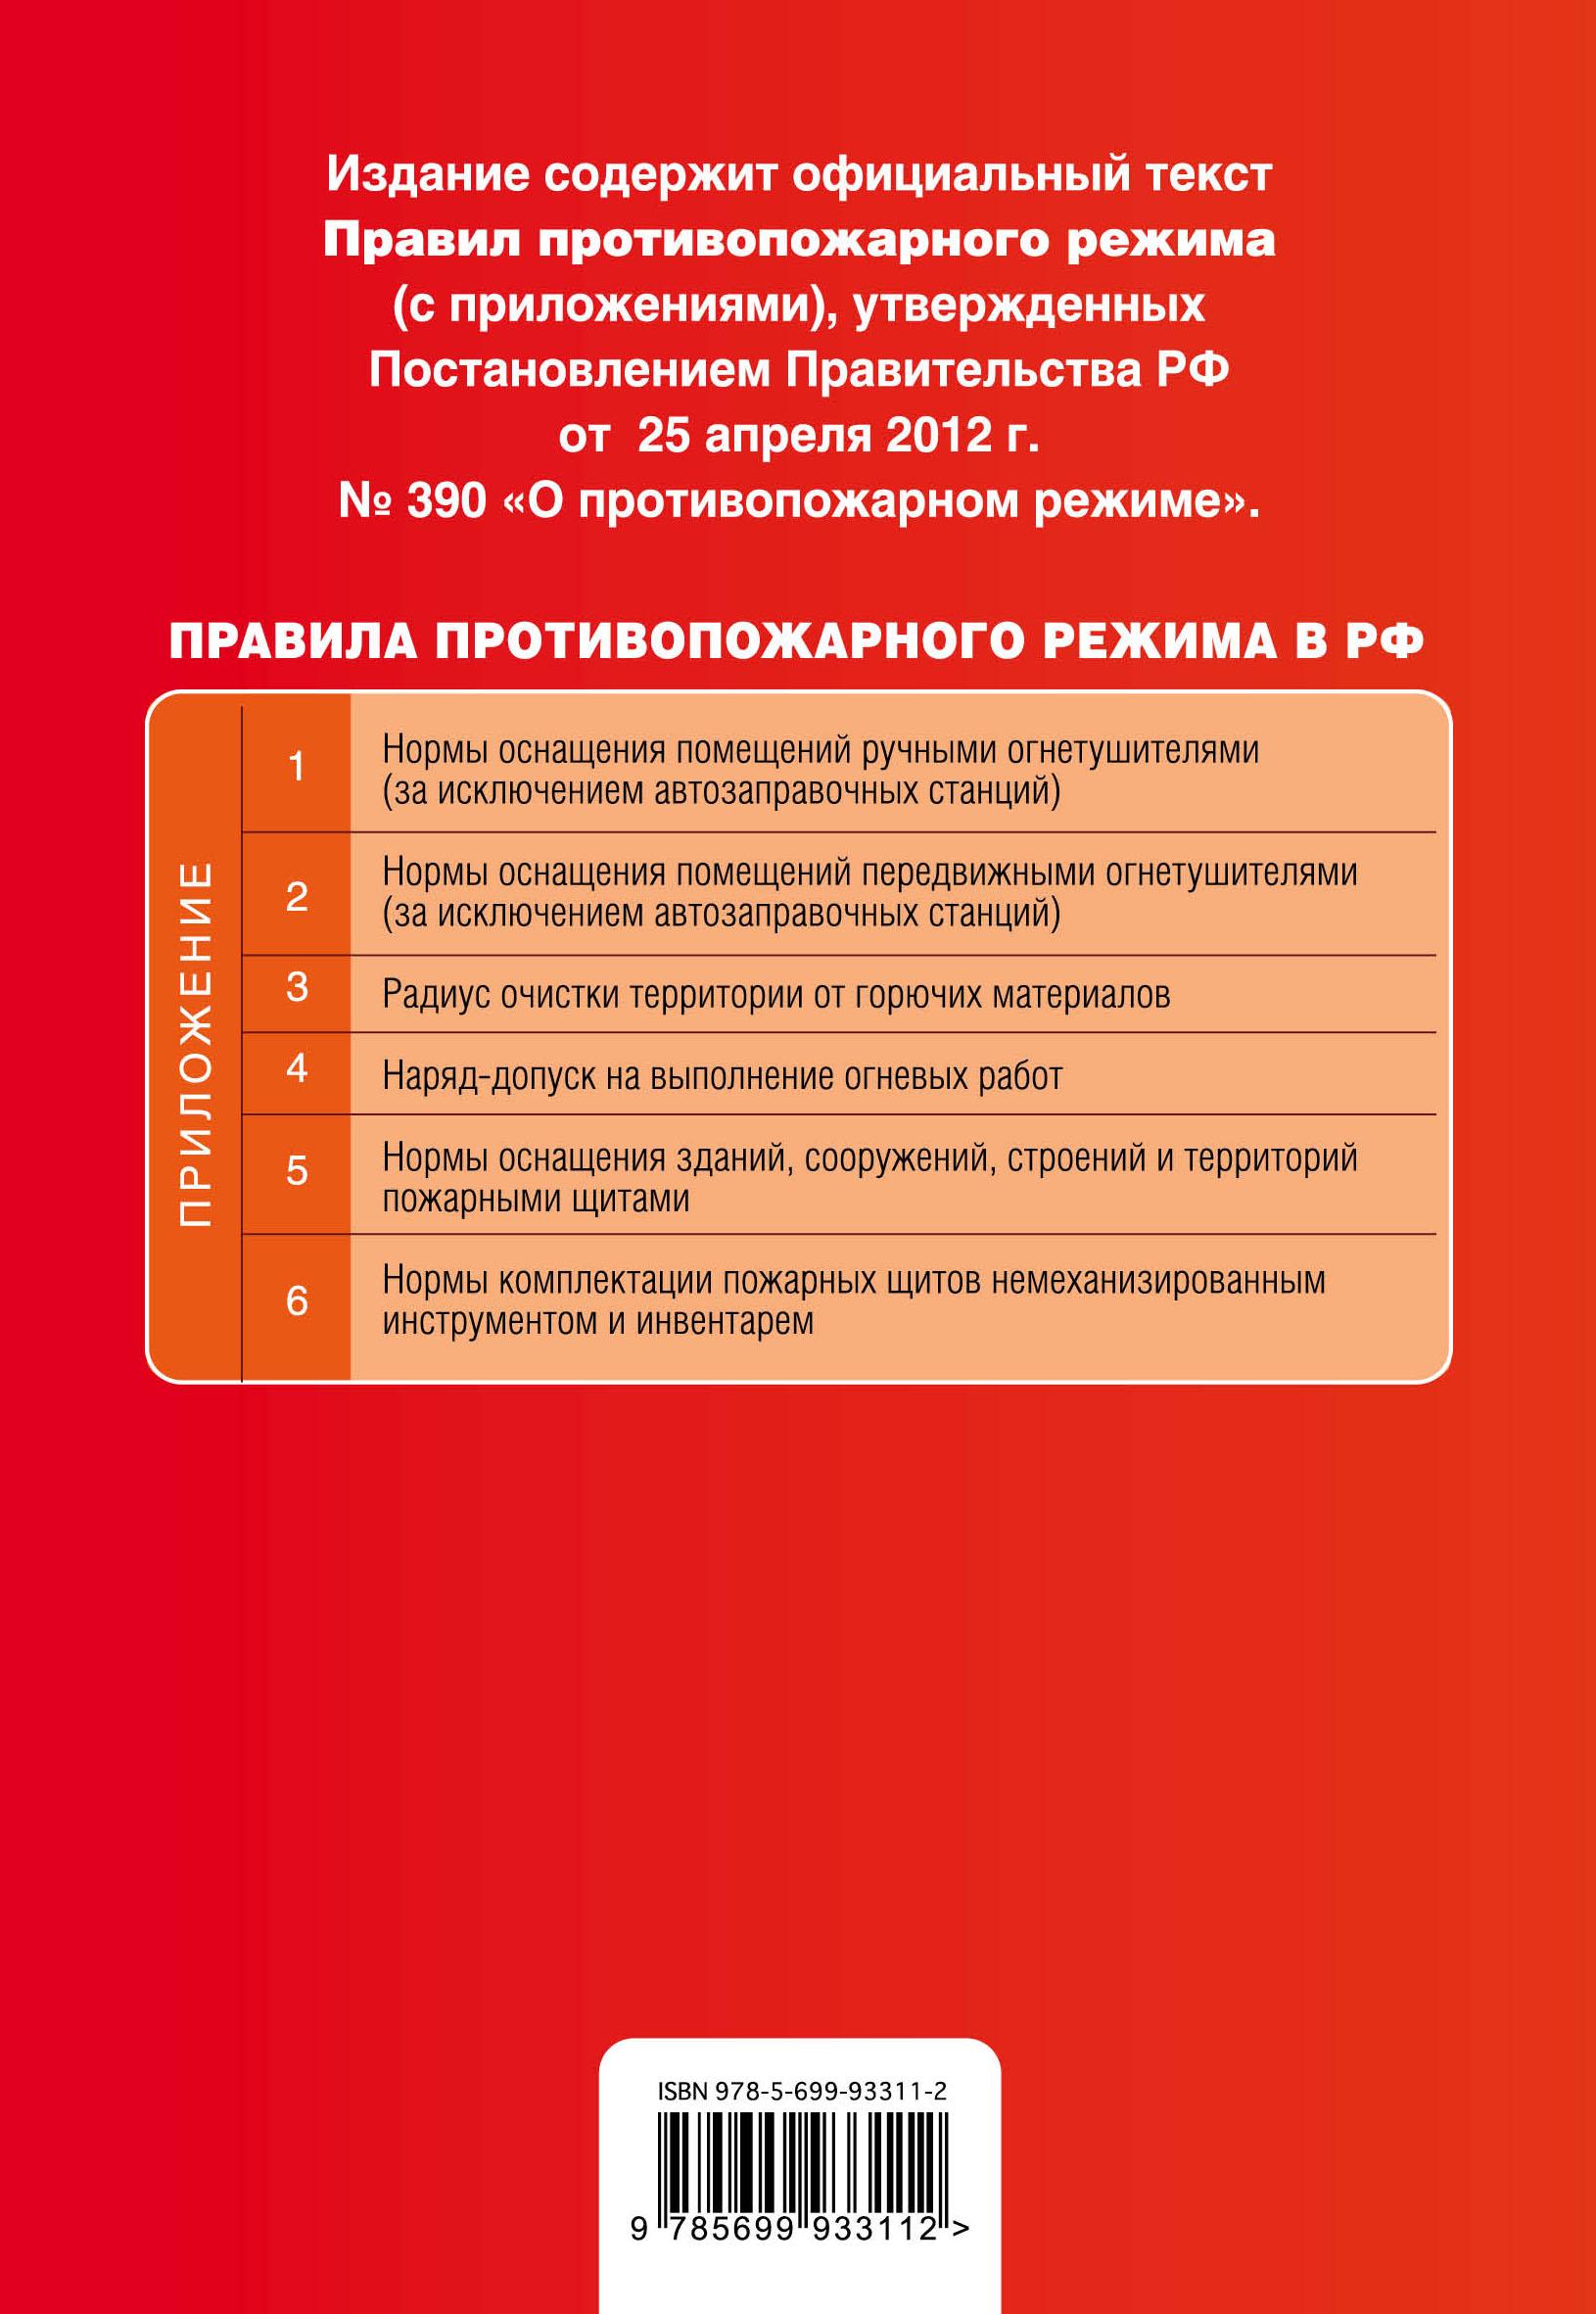 инструкции по охране труда при производстве ацетилена